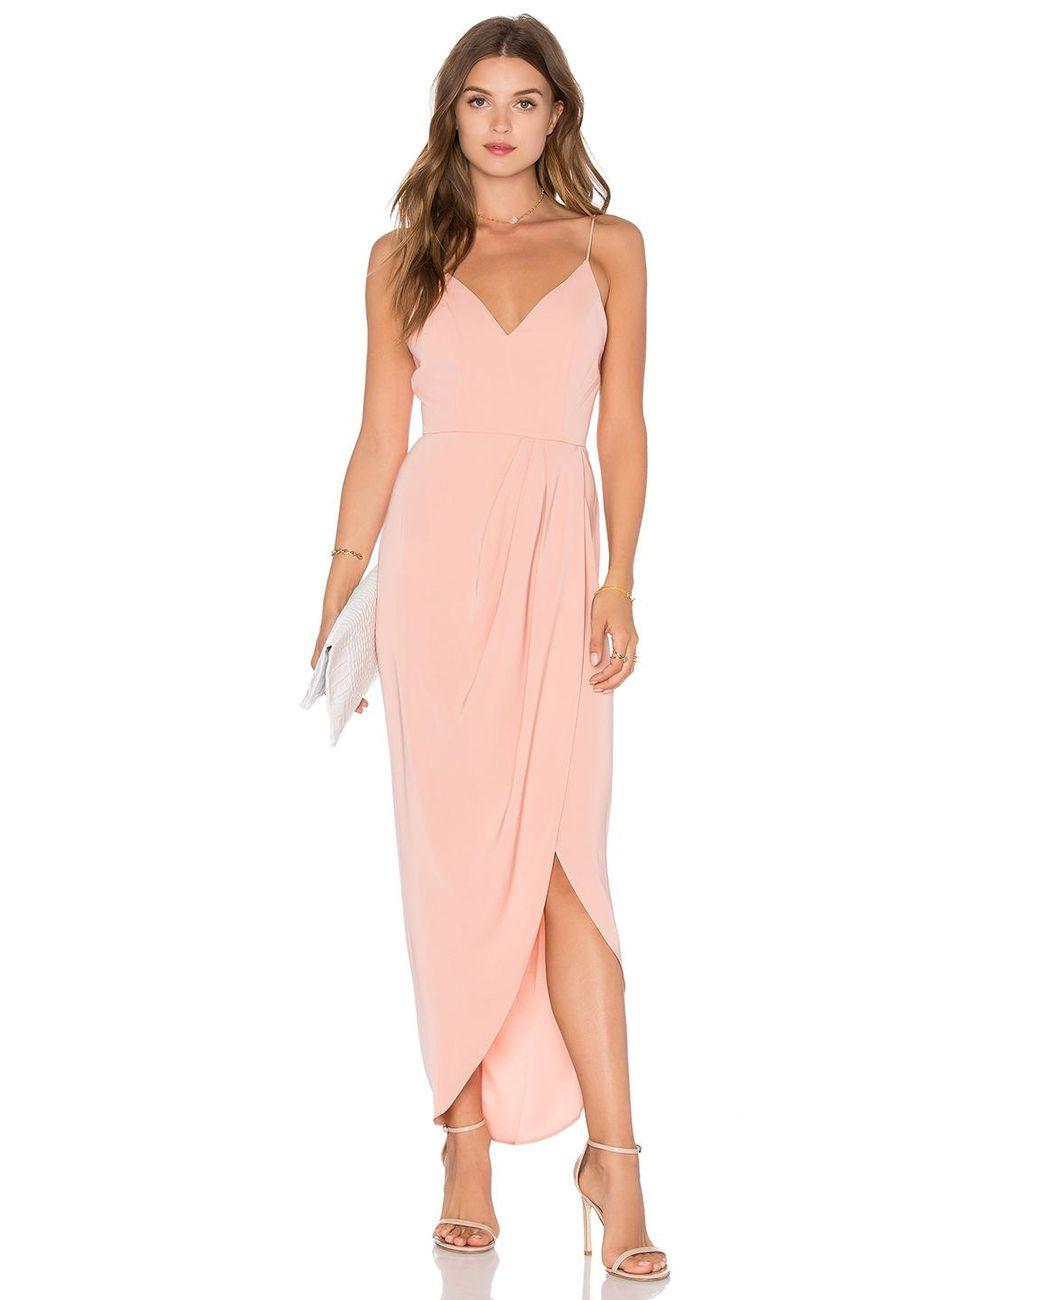 25003db84230 Shona Joy Cocktail Draped Dress in Pink - Lyst